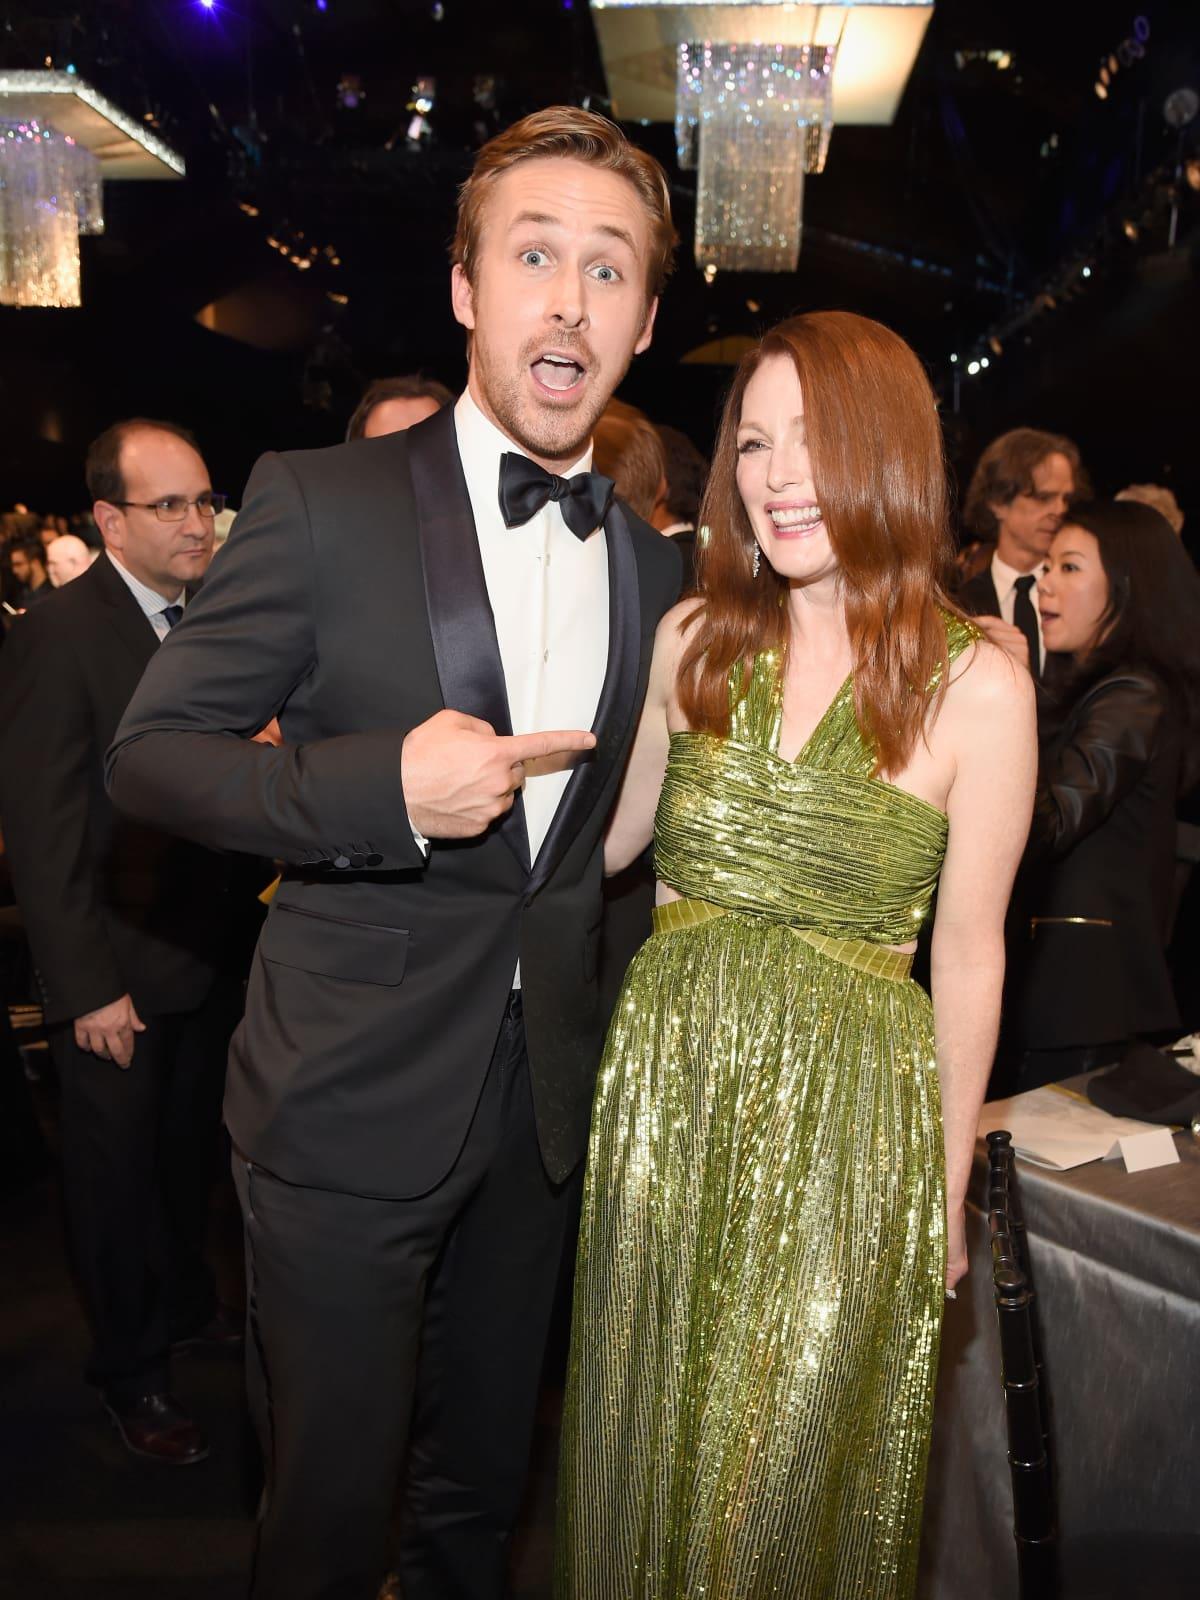 Ryan Gosling and Julianne Moore at Screen Actors Guild Awards